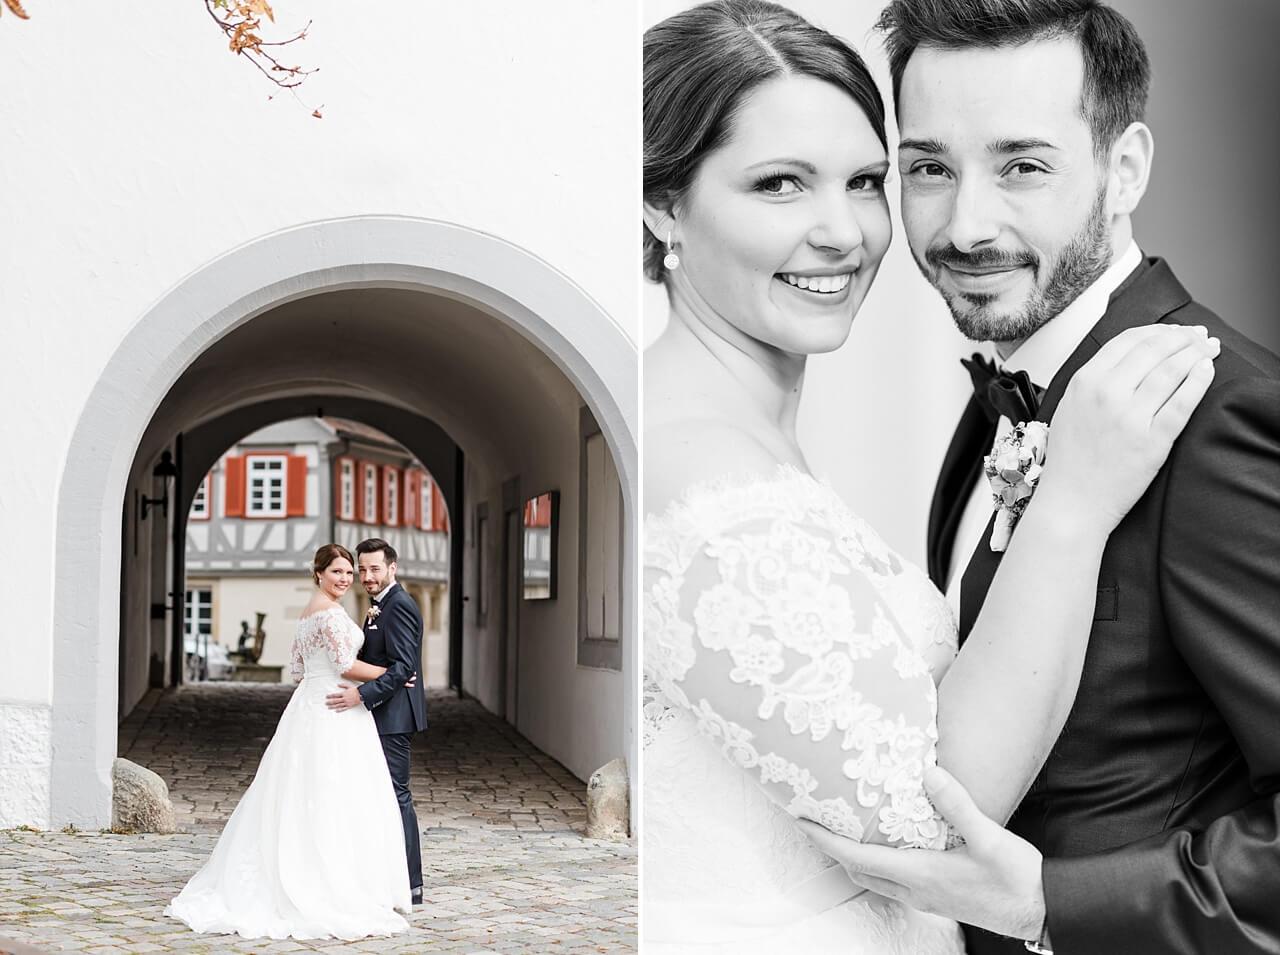 Rebecca Conte Fotografie: Herbsthochzeit Schloss Koengen 10